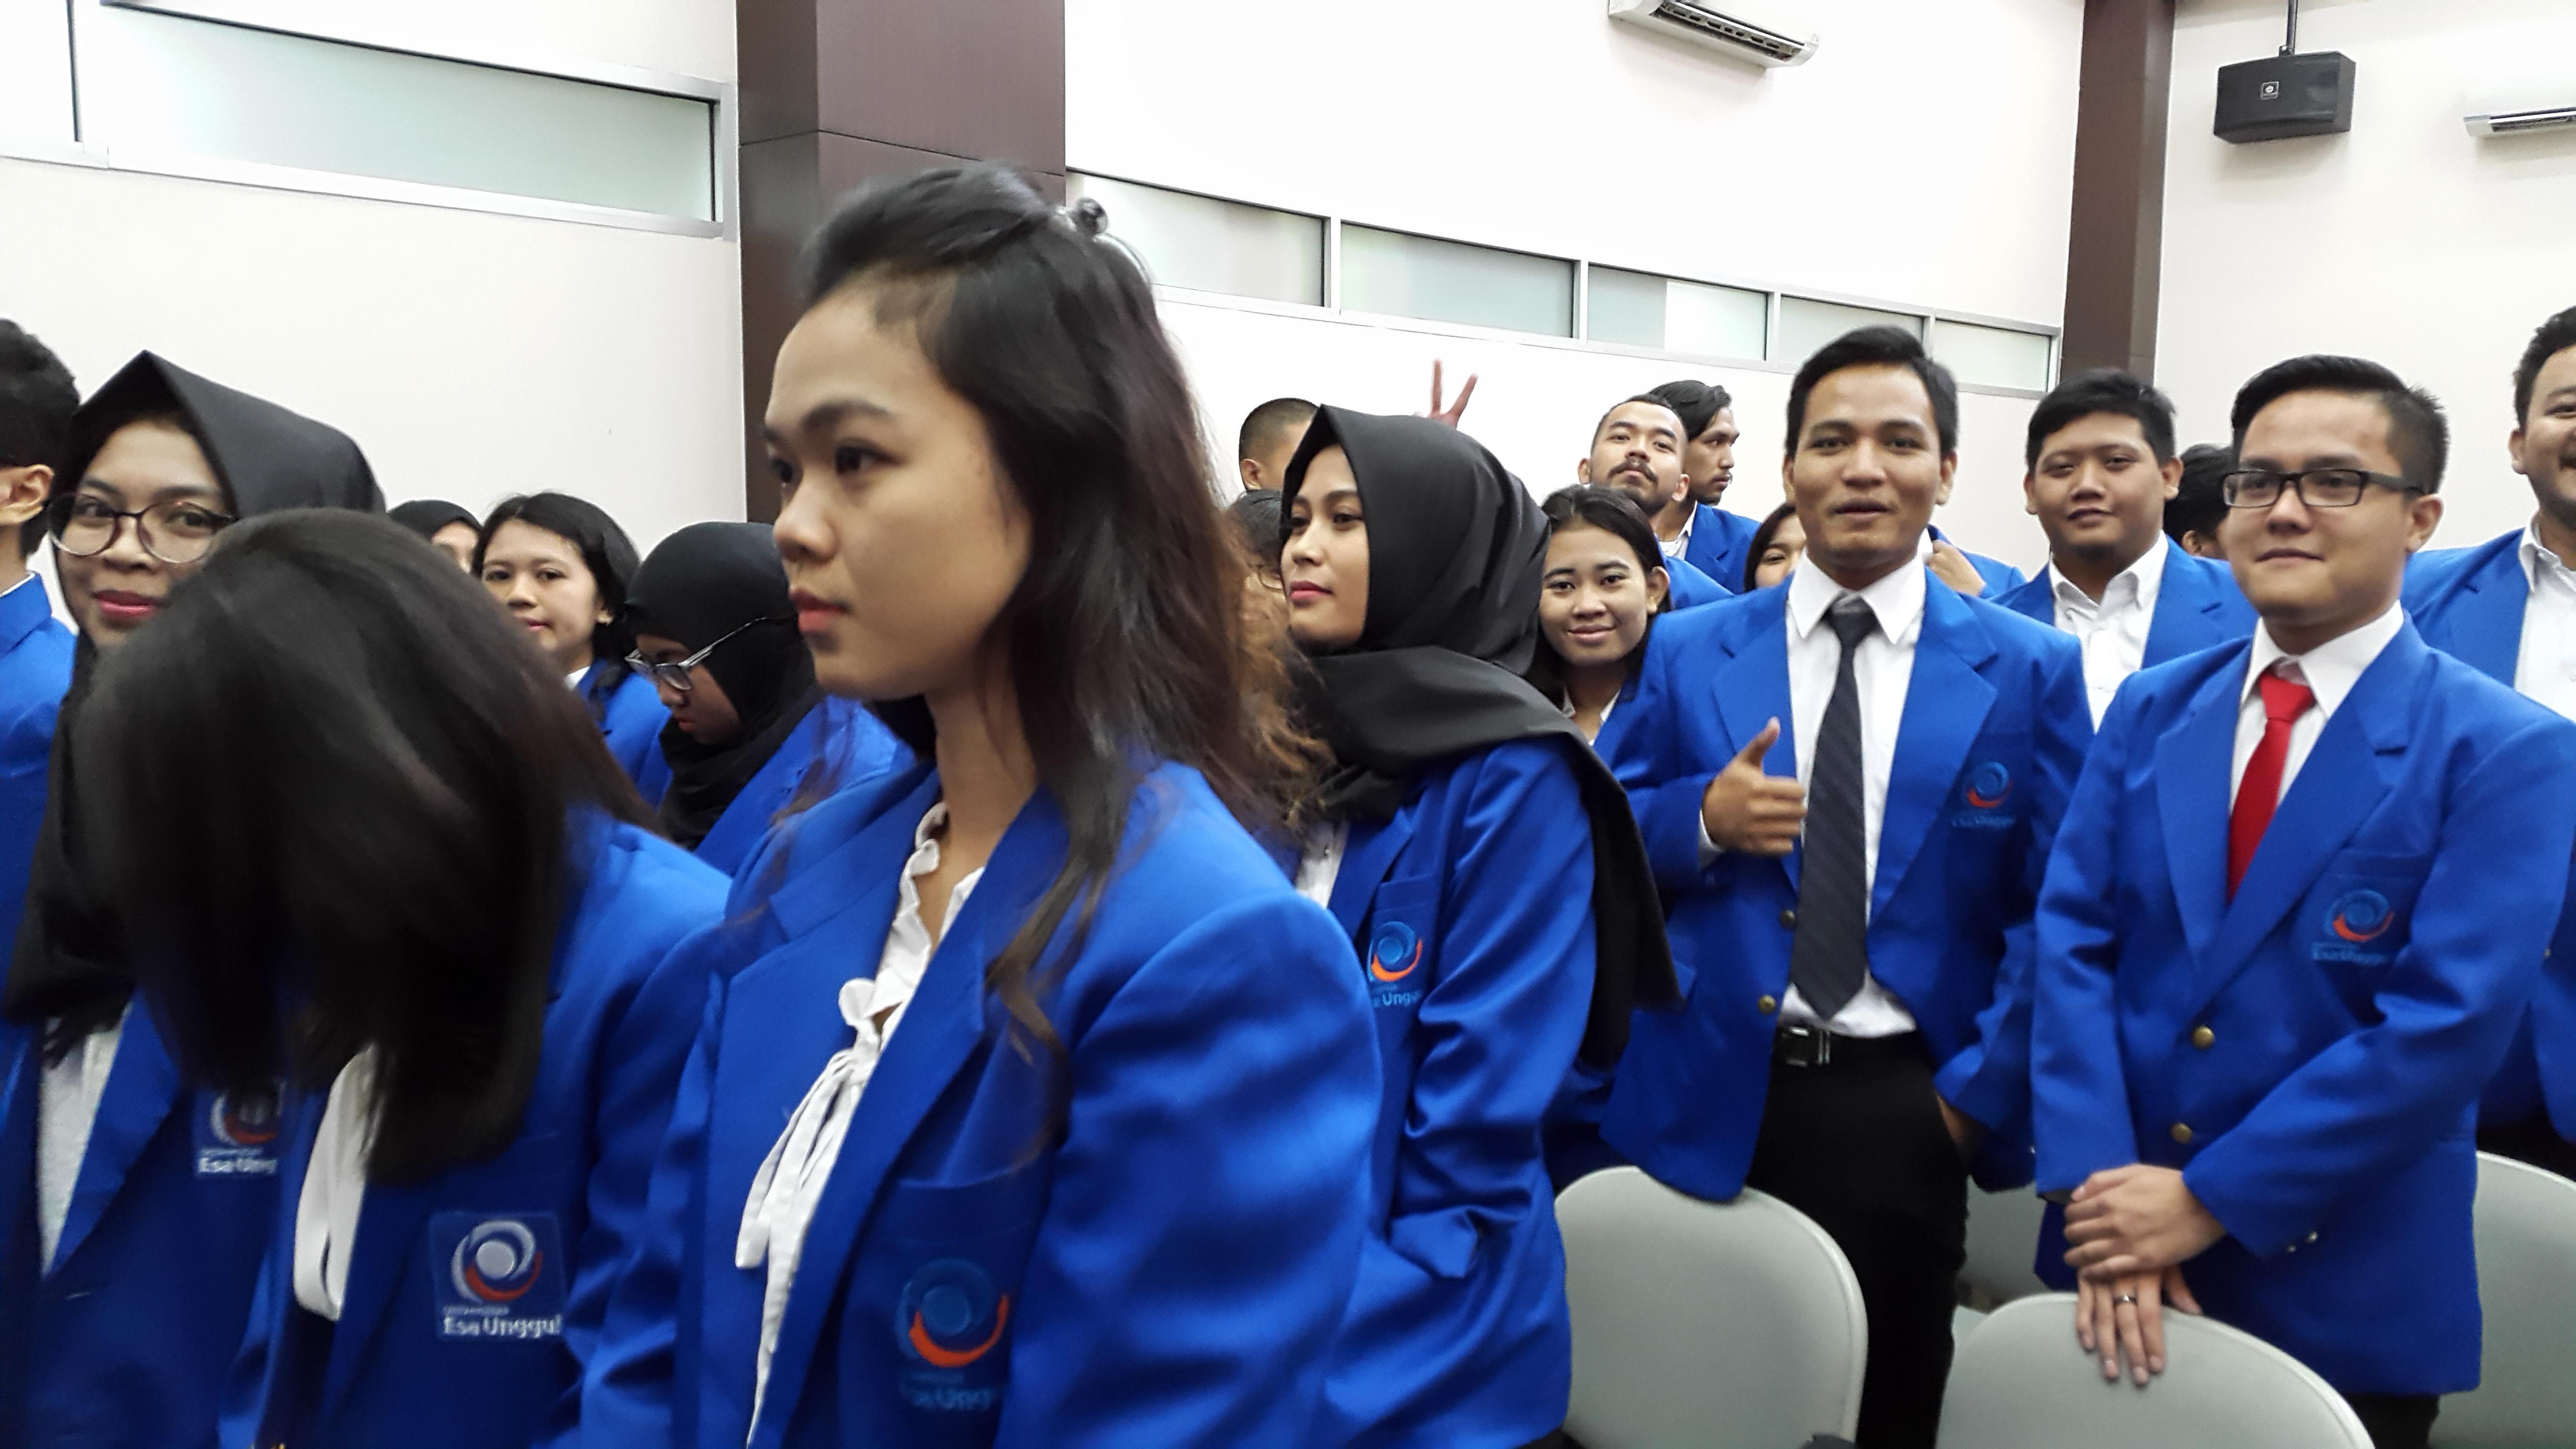 Beasiswa Penuh Kuliah S1 Jakarta – Universitas Esa Unggul (UEU)